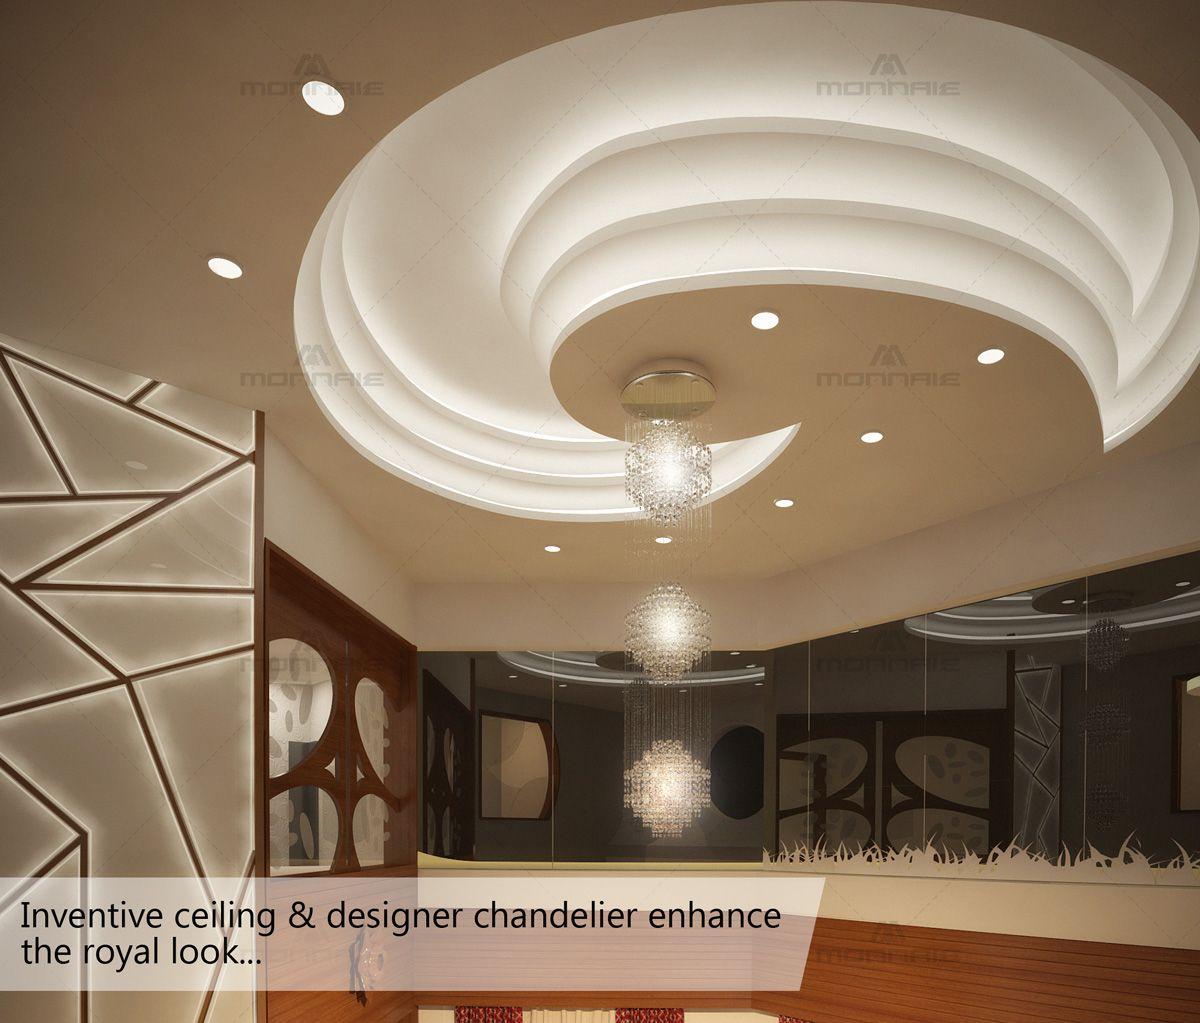 Living Room Interiordesign Bangalore: Inventive Ceiling & Designer Chandelier Enhance The Royal